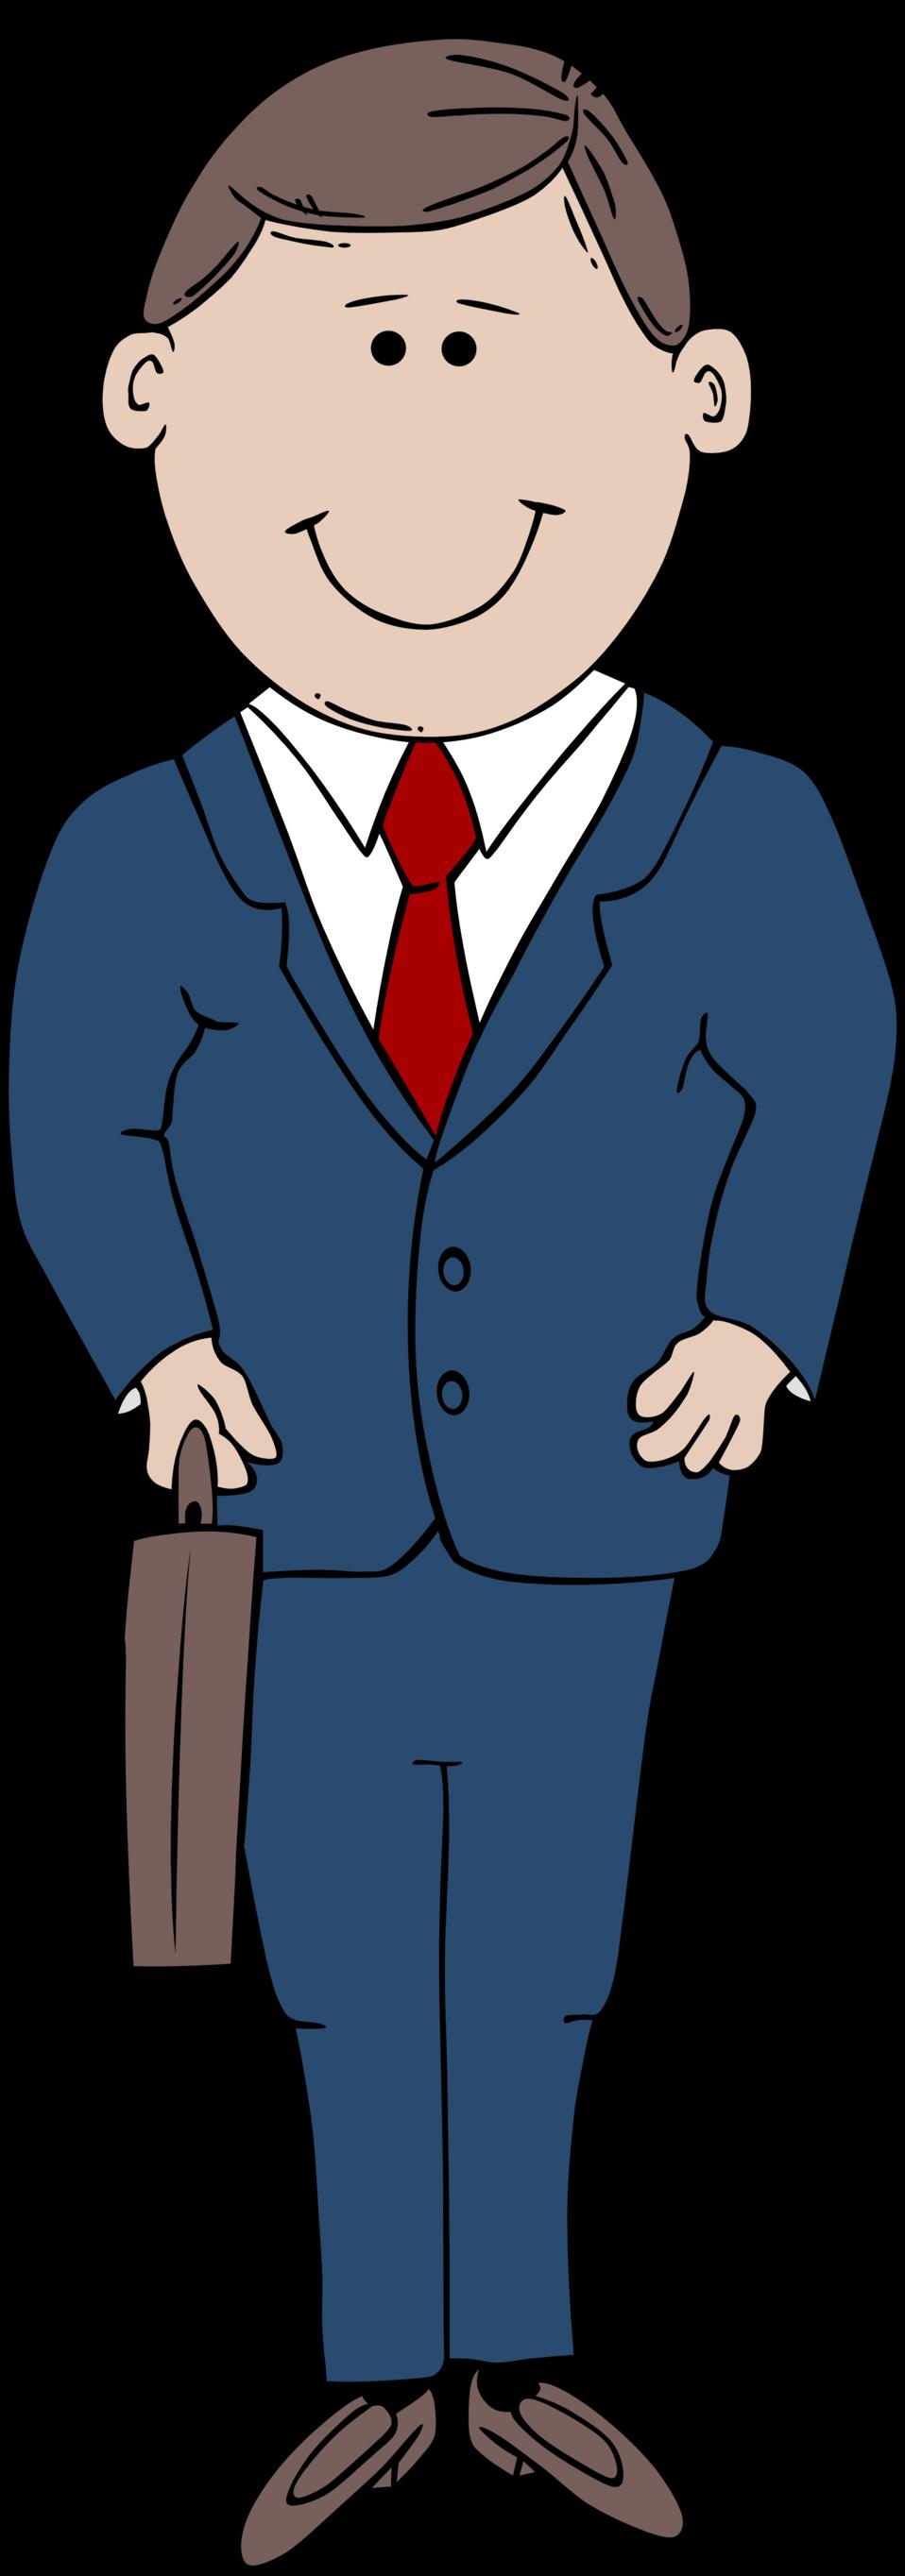 Illustration of a cartoon businessman